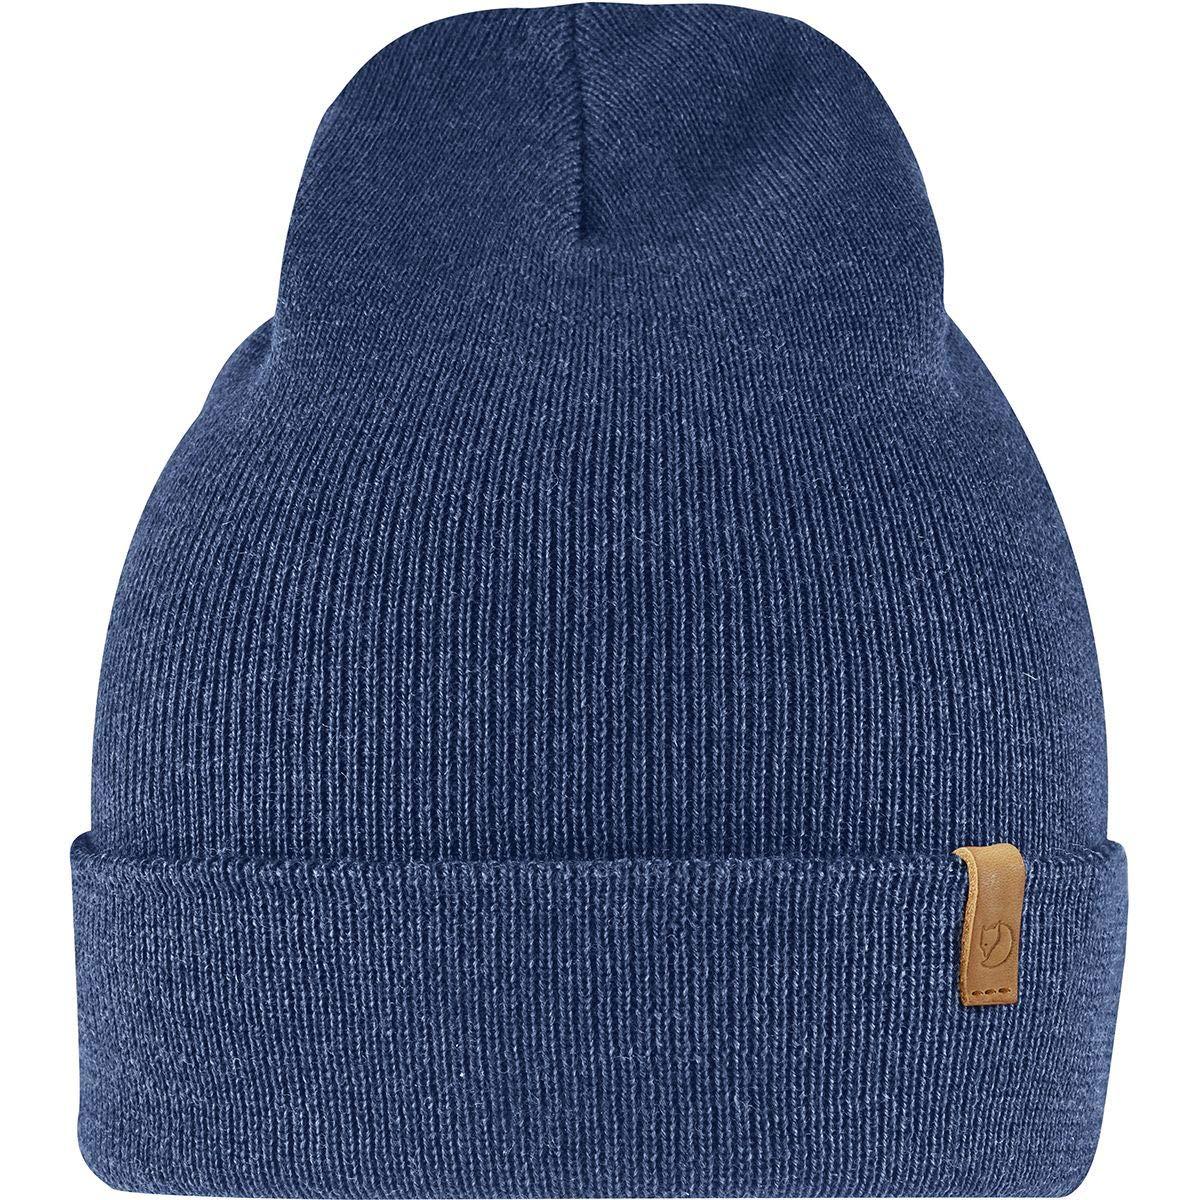 Fjällräven Classic Knit, Unisex Adult Hat, unisex adult, F77368 Black One Size 77368-550